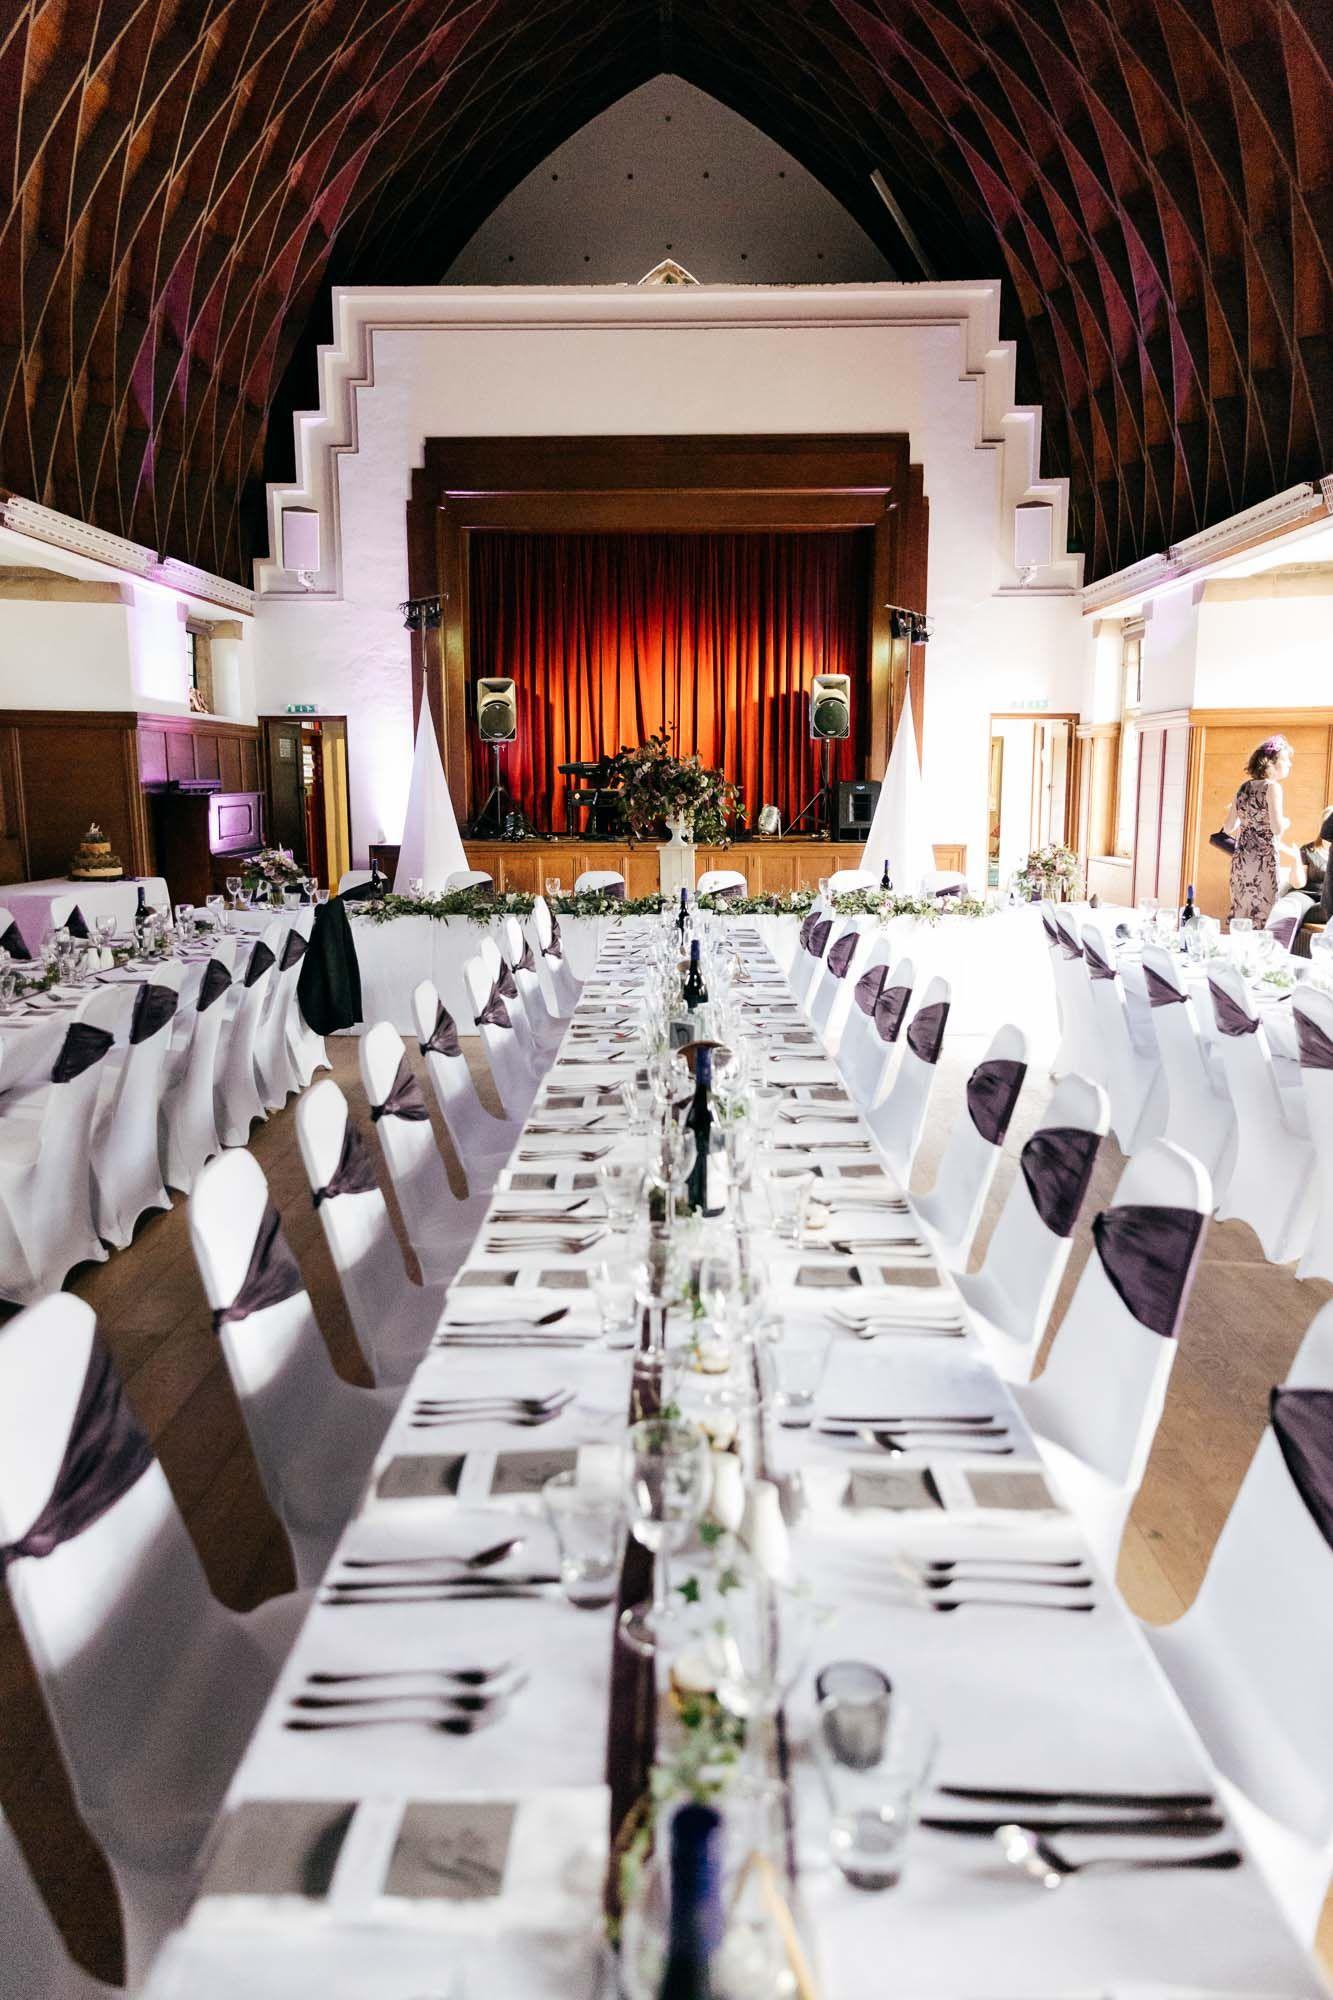 Unique Church Wedding Venue Captured By Creative Gloucestershire